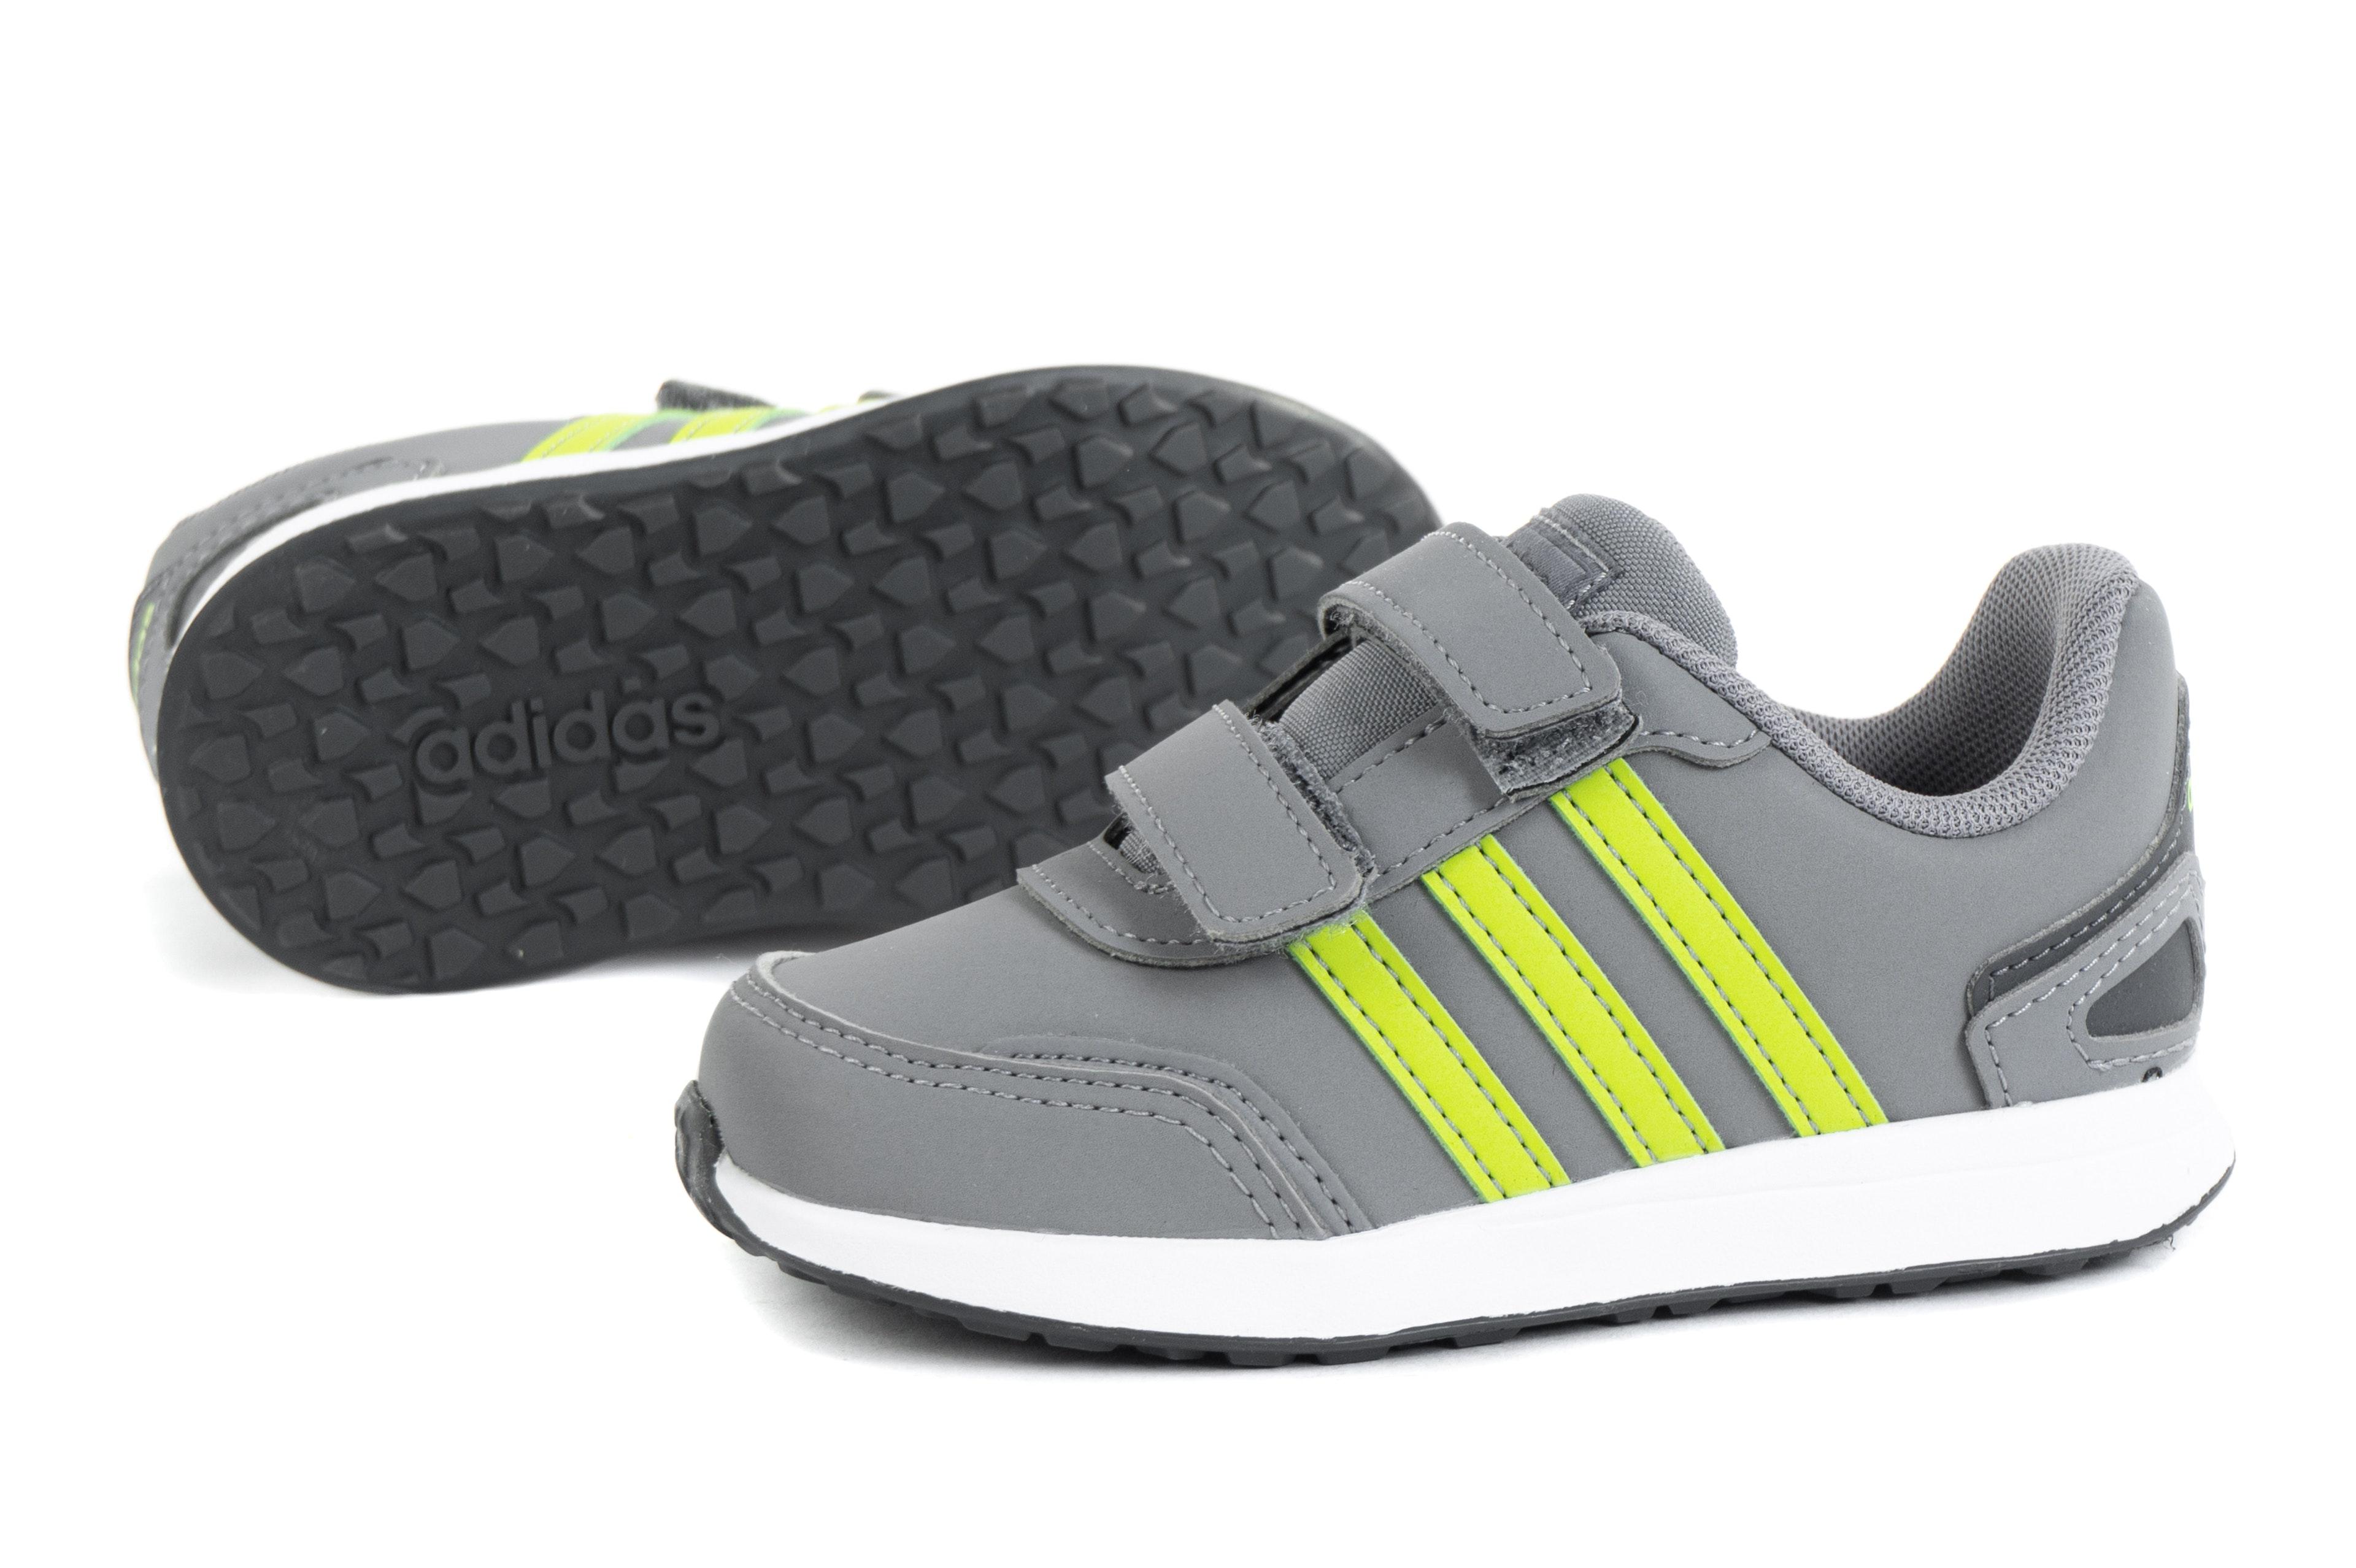 adidas VS SWITCH 3 I H01743